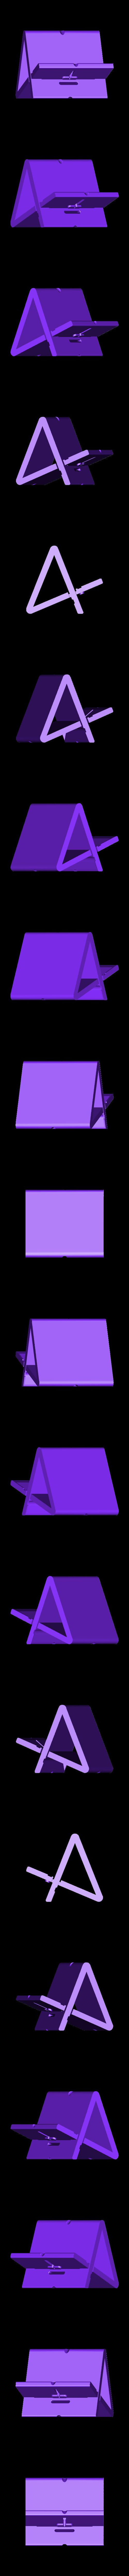 Apad_by_Apex_Studio..STL Download free STL file Apad   Variable Angle Ipad Dock • 3D printable object, Avooq